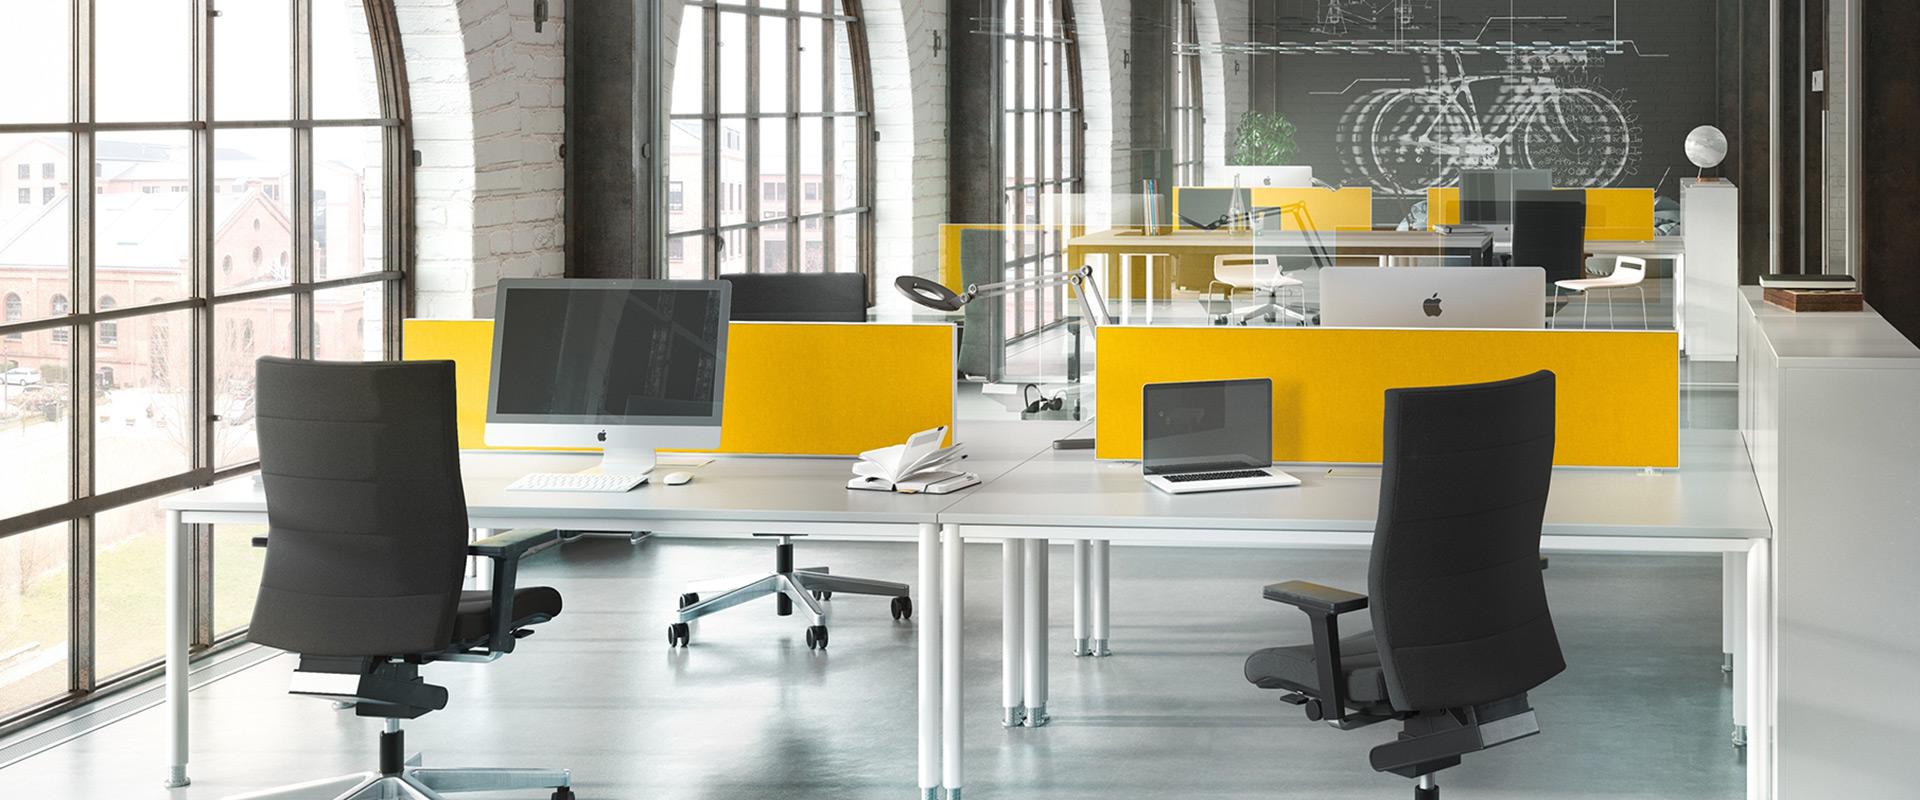 Satec Büromöbel   Wir richten Büros ein